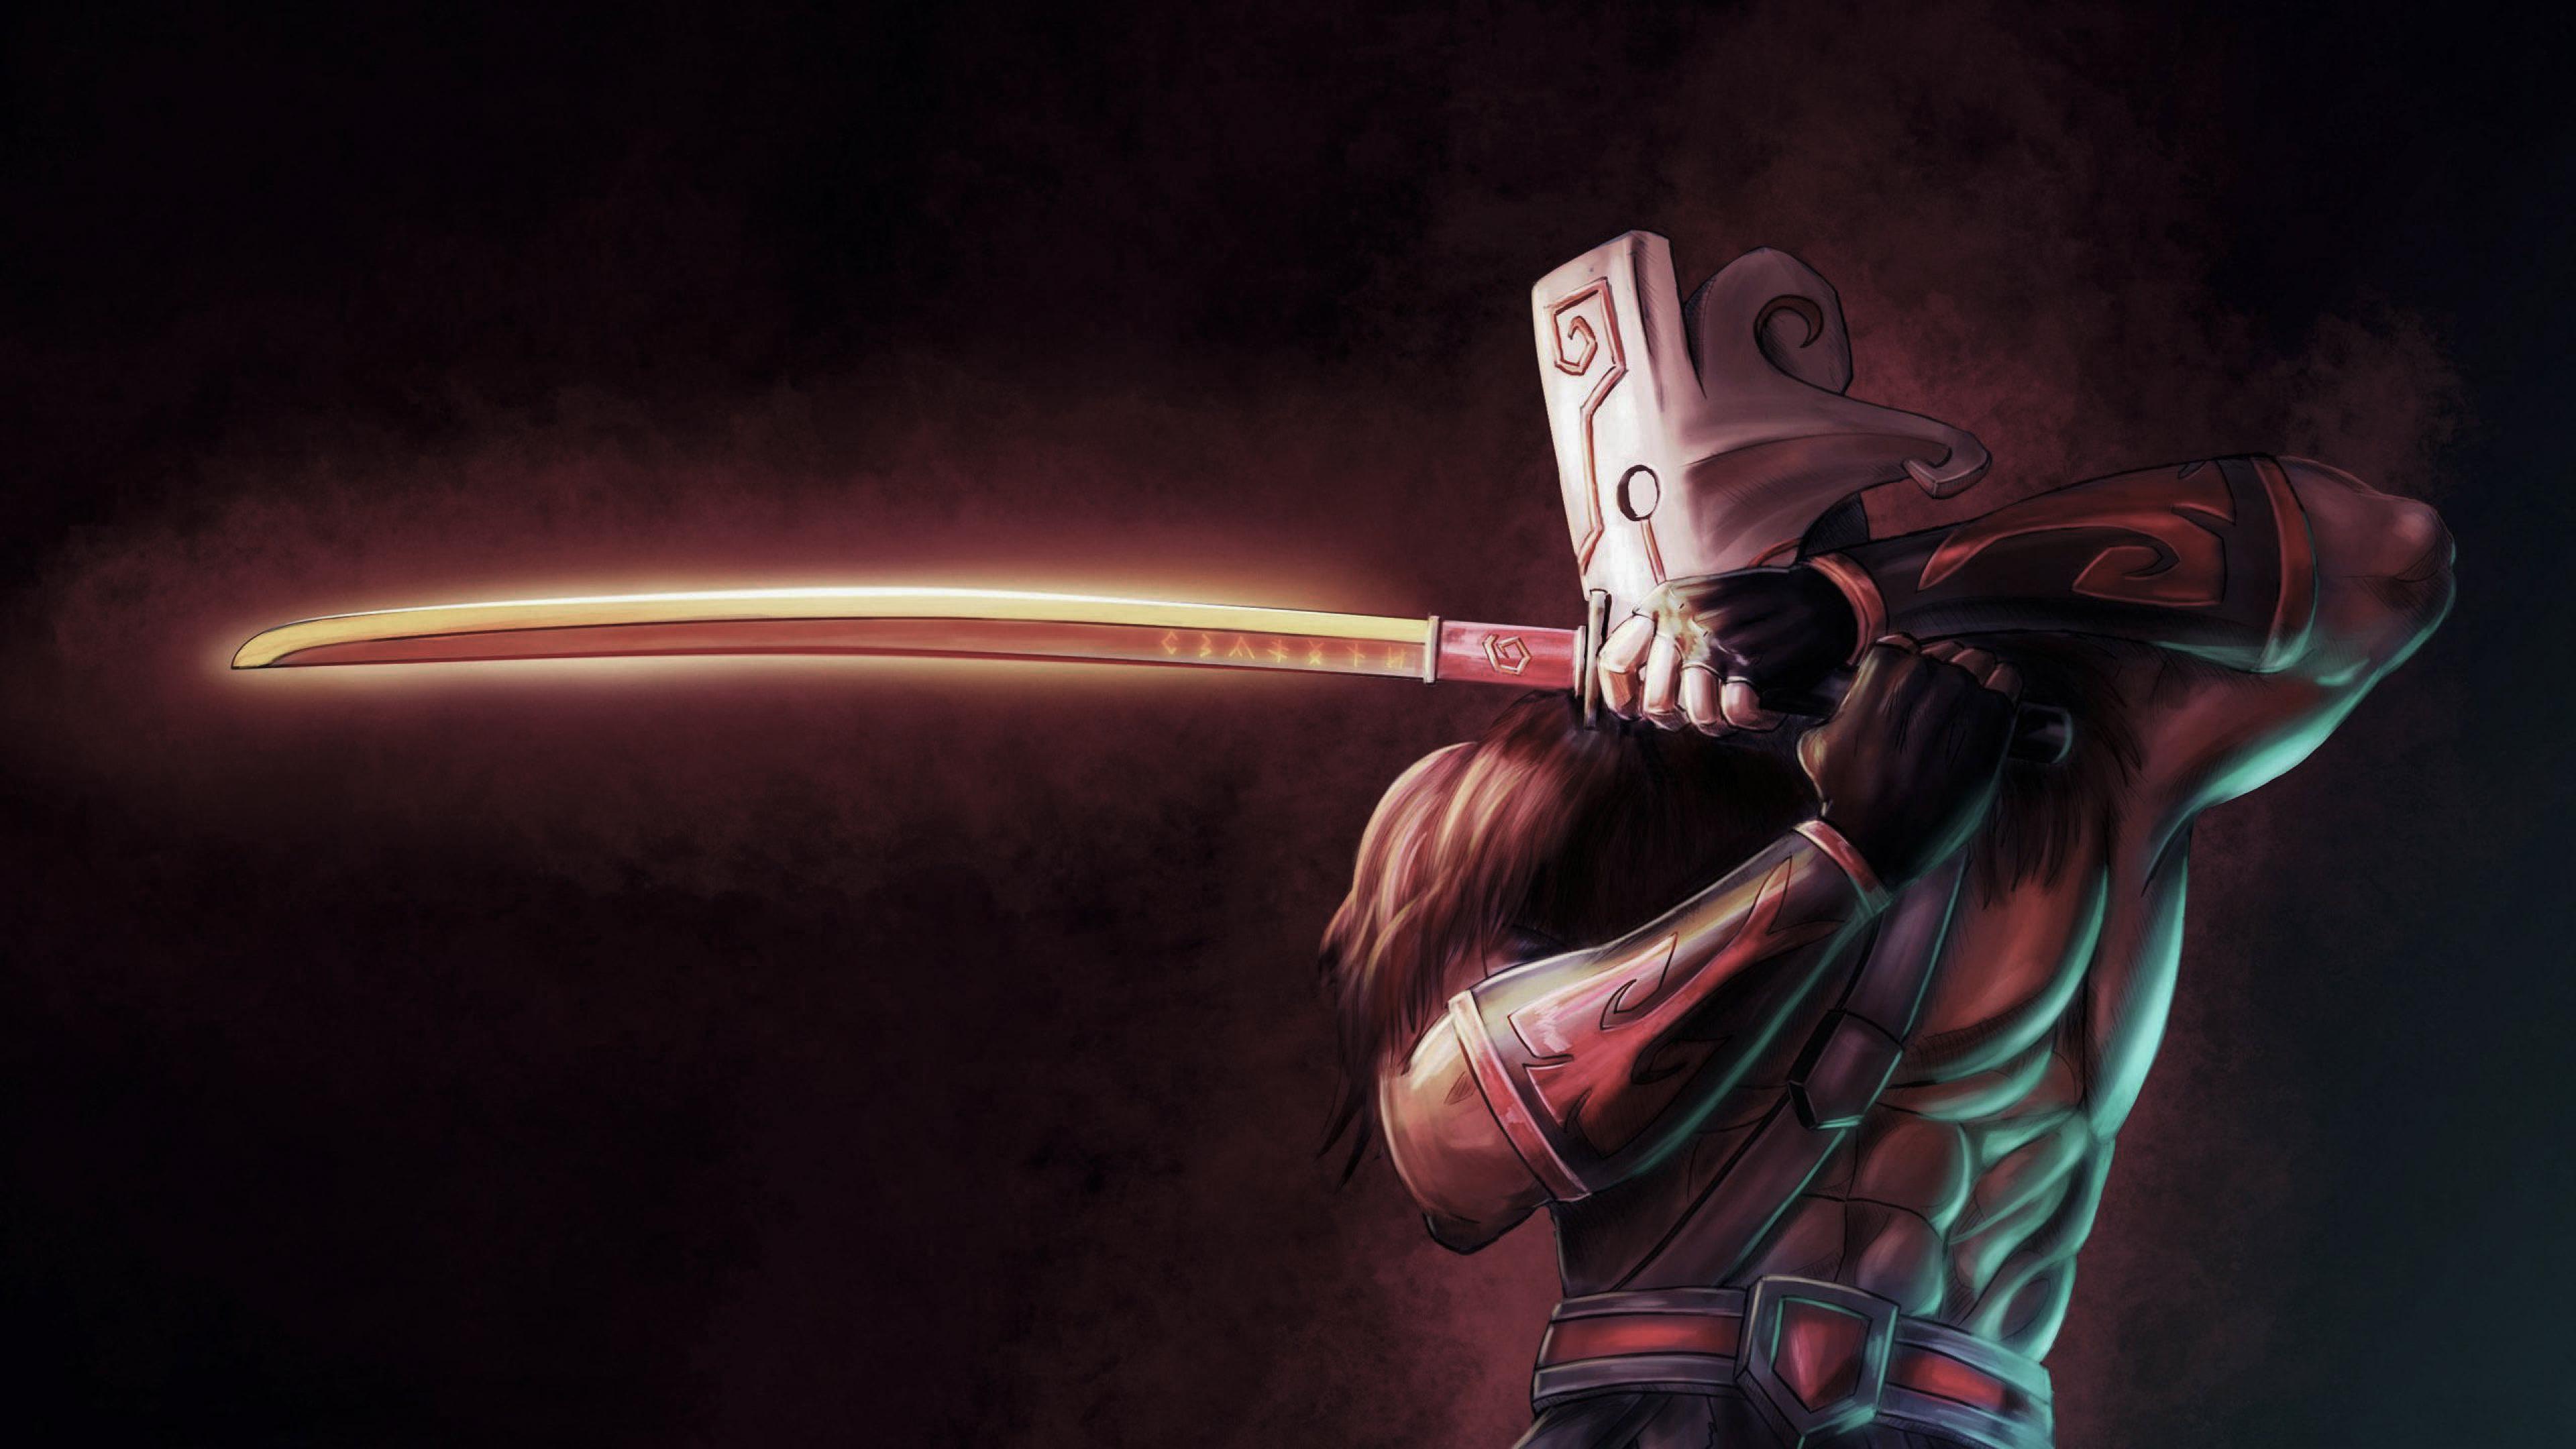 Juggernaut Dota 2 Hd Games 4k Wallpapers Images Backgrounds